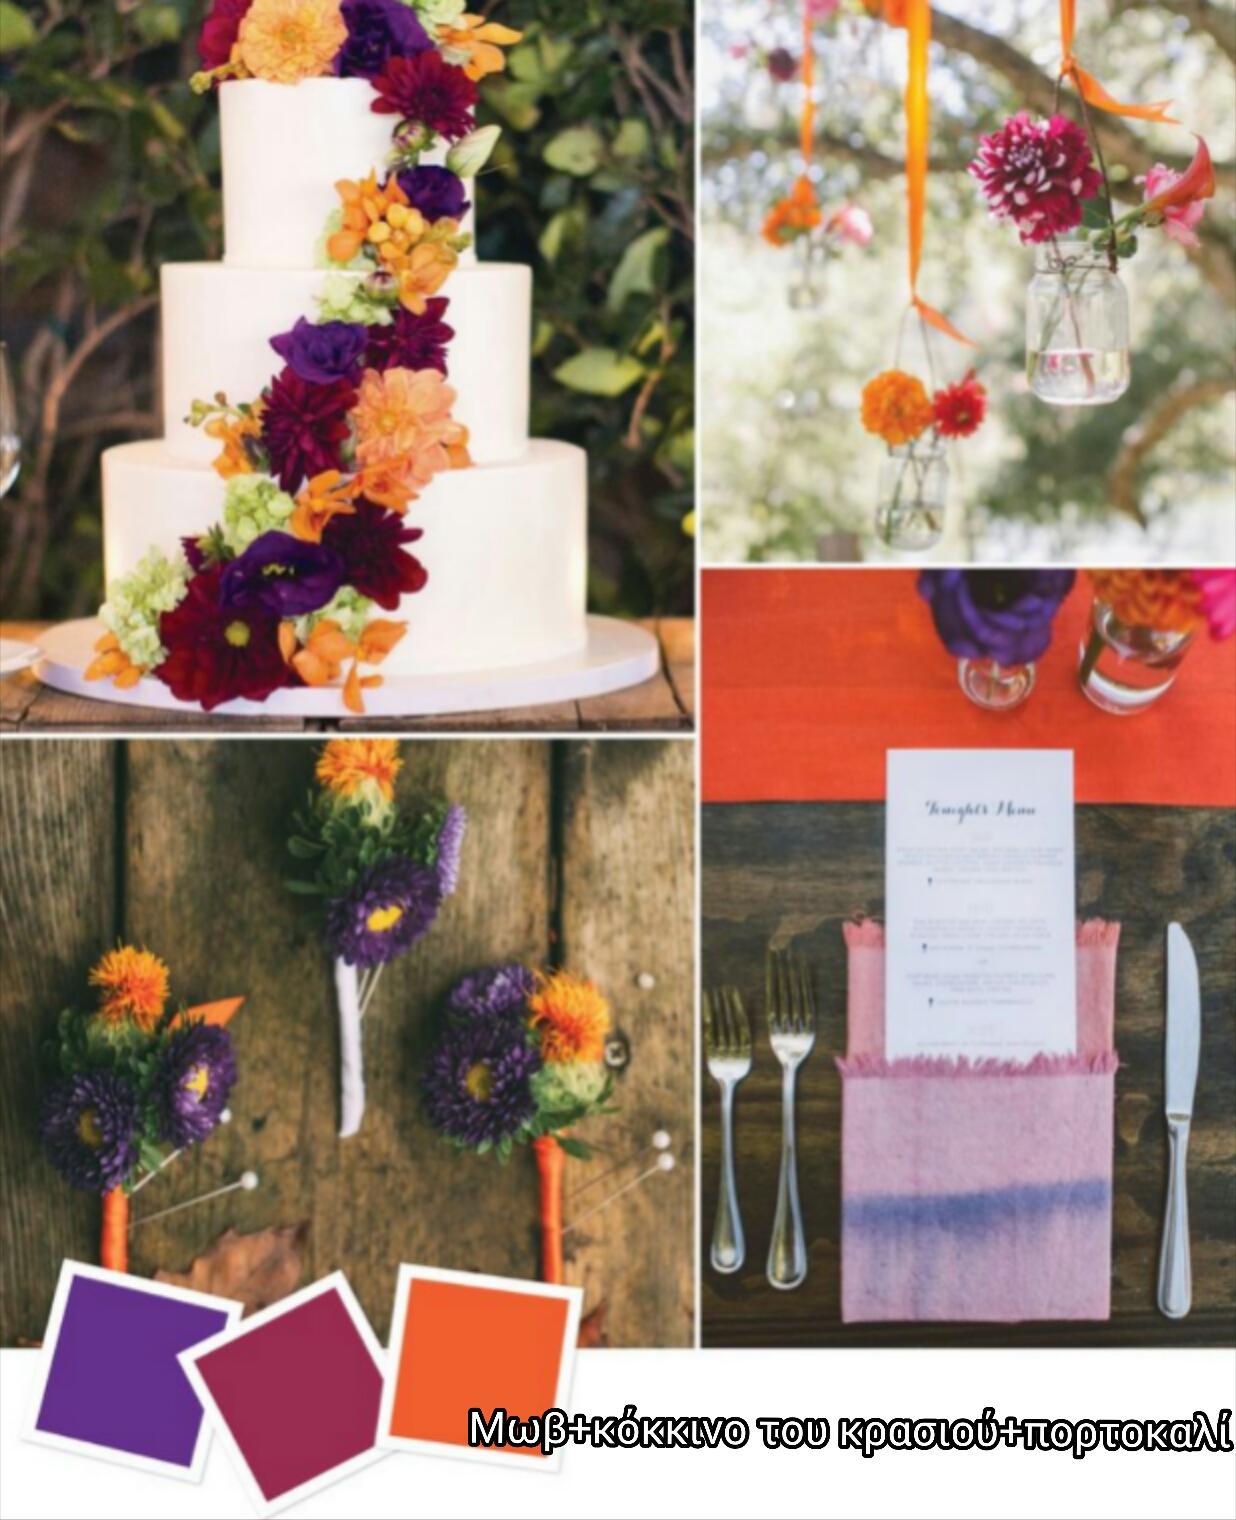 4b81769fa0a1 Σου αρέσουν τα χρώματα  Πως θα σου φαινόταν ο γάμος σου να είχε να είχε  χρώμα και χαρακτήρα  Γνωρίζουμε καλά ότι είναι δύσκολο να καταλήξεις σε ένα  ...